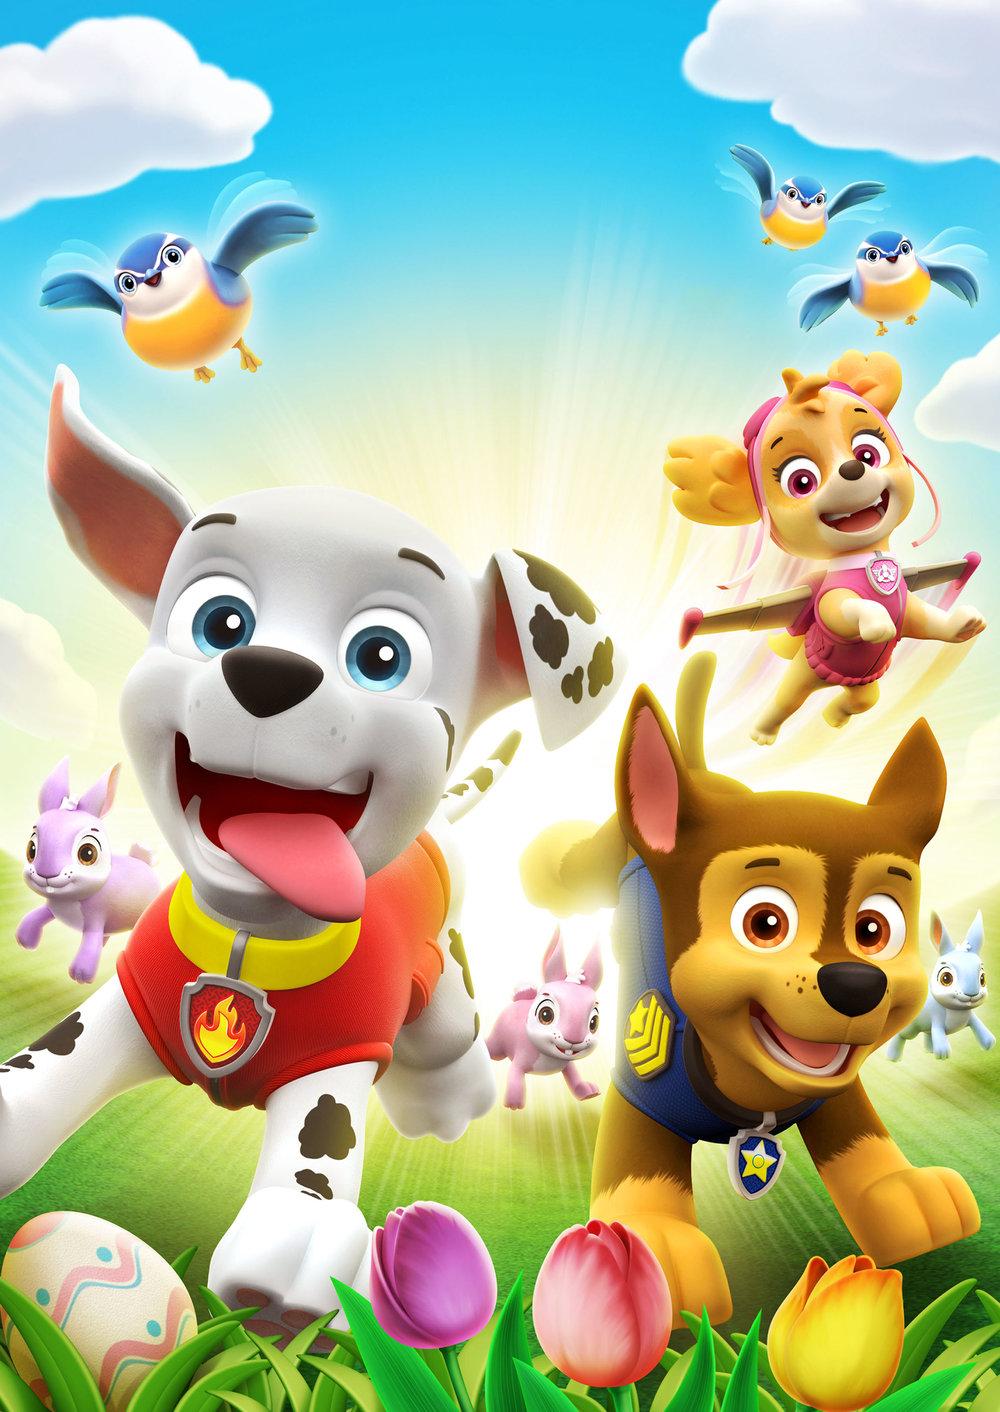 Paw-Patrol_Pups-Save-The-Bunnies.jpg